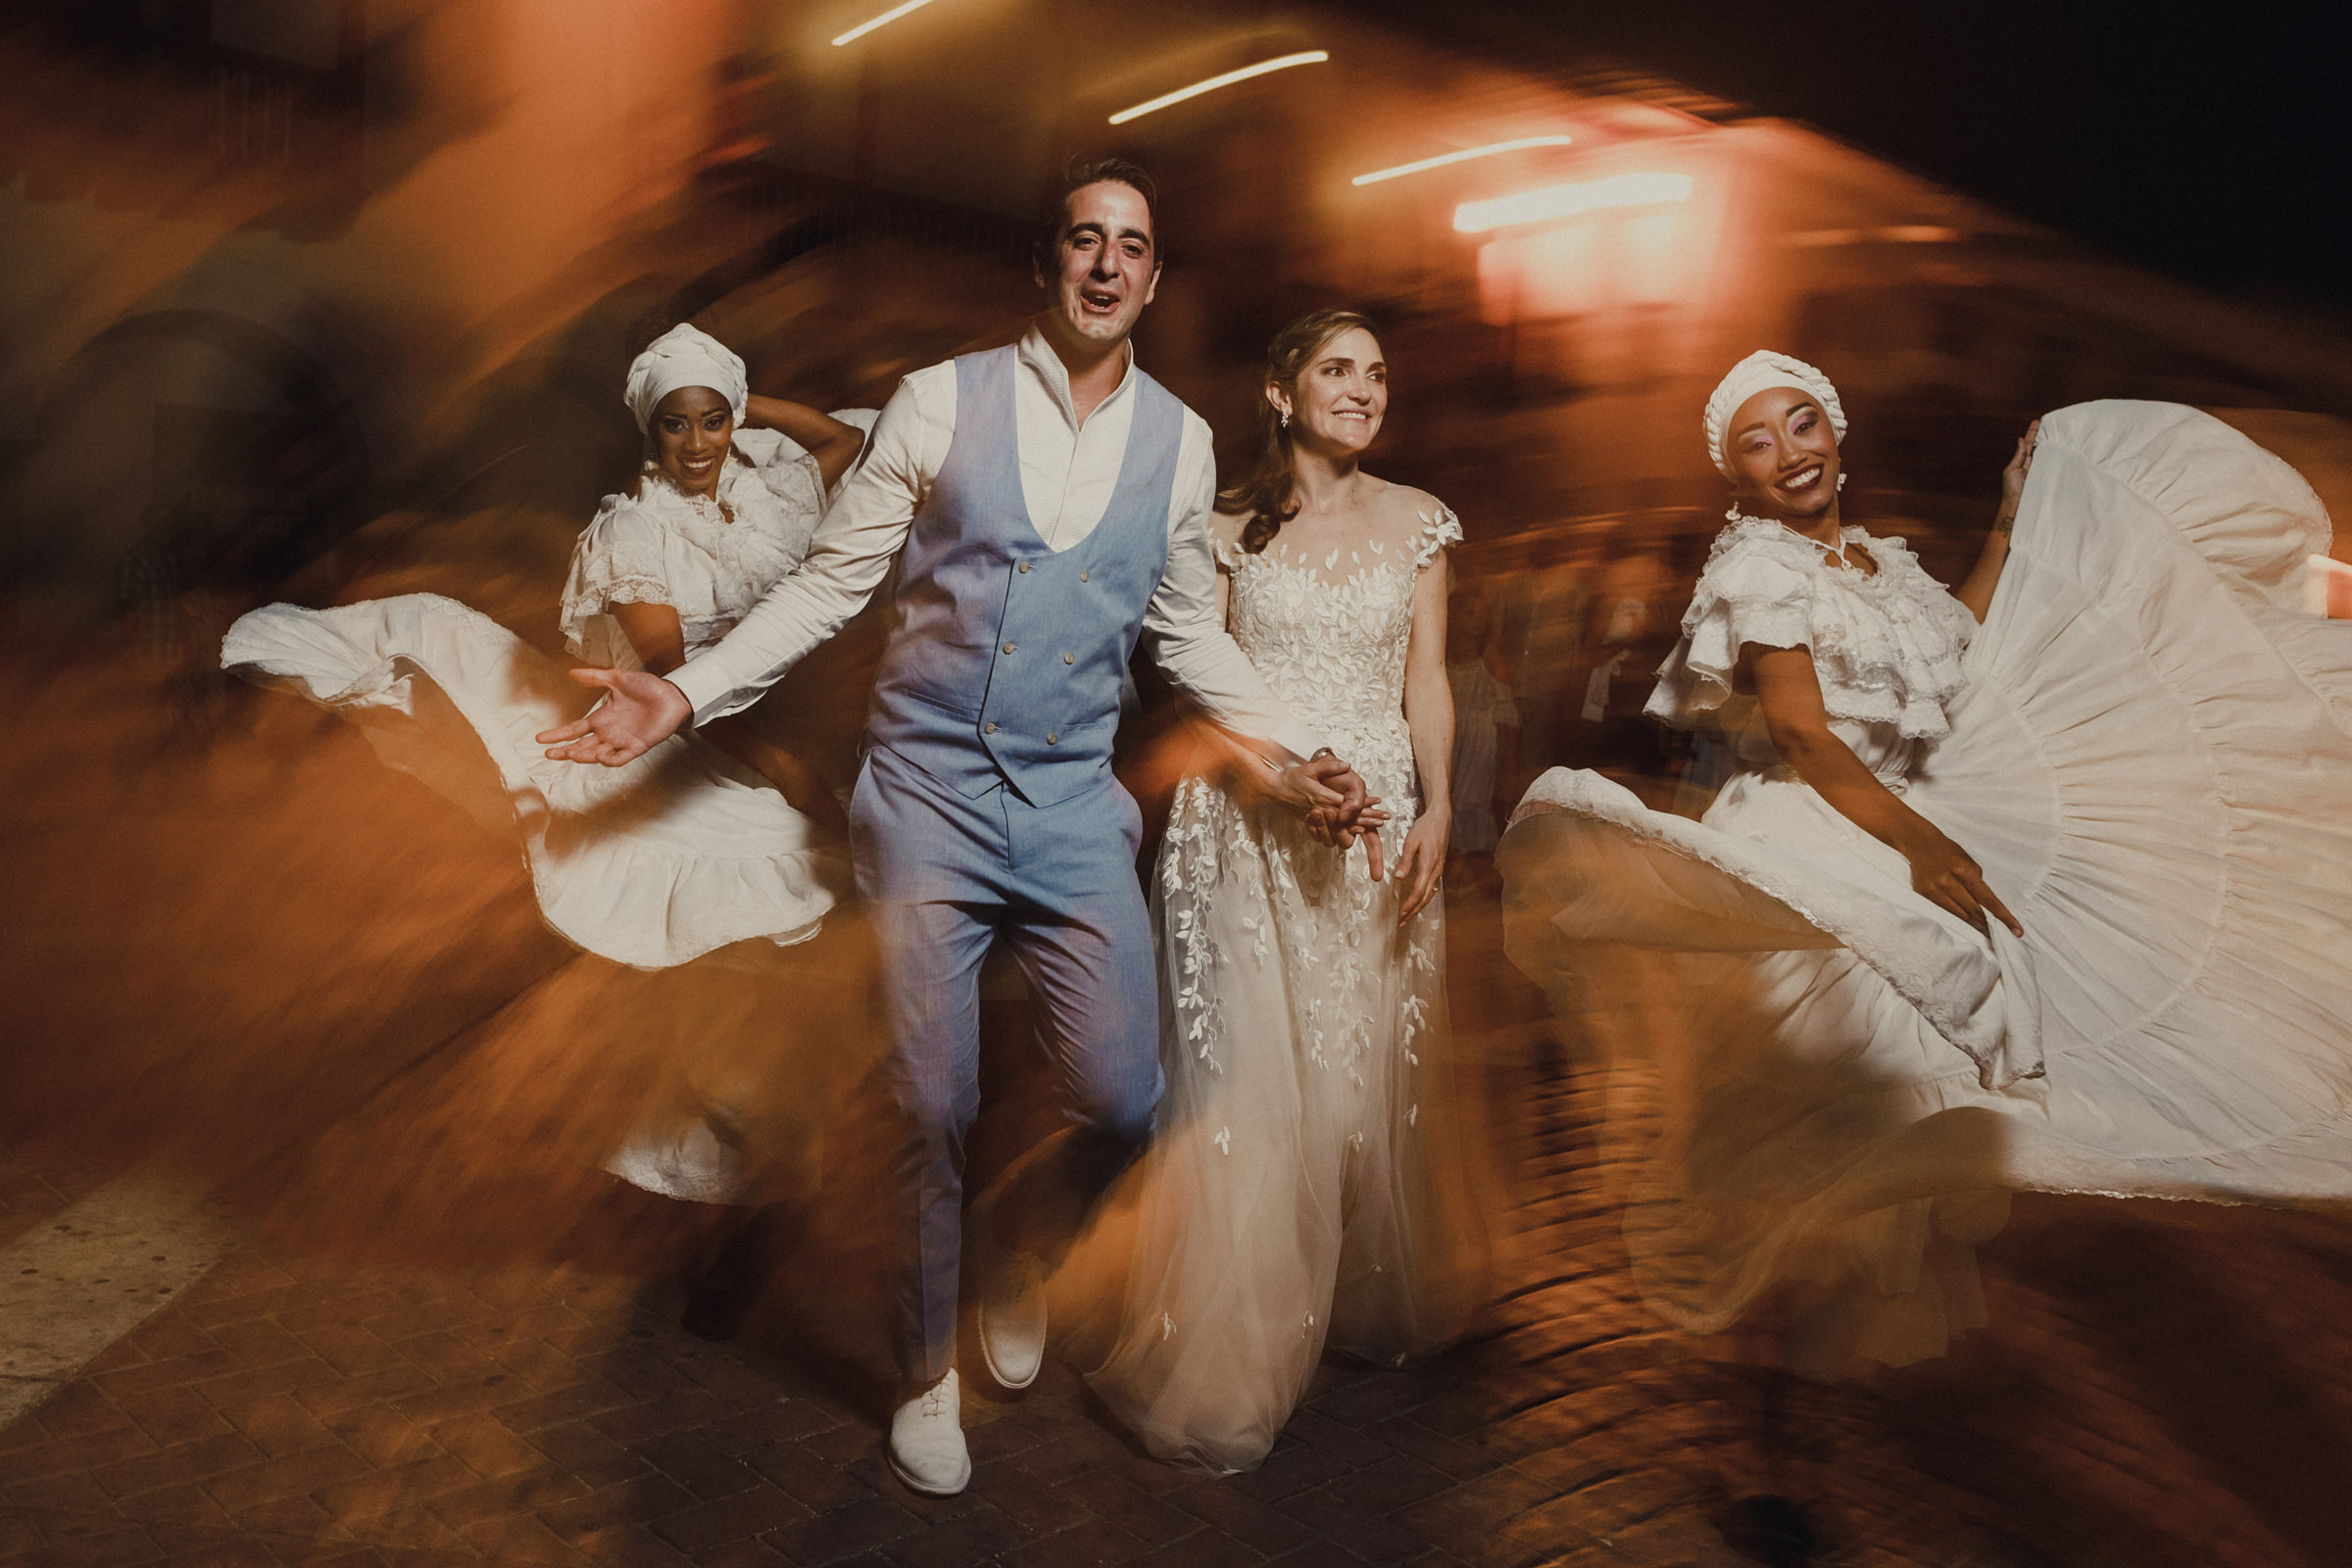 Radial blur dance photo - photo by El Marco Rojo